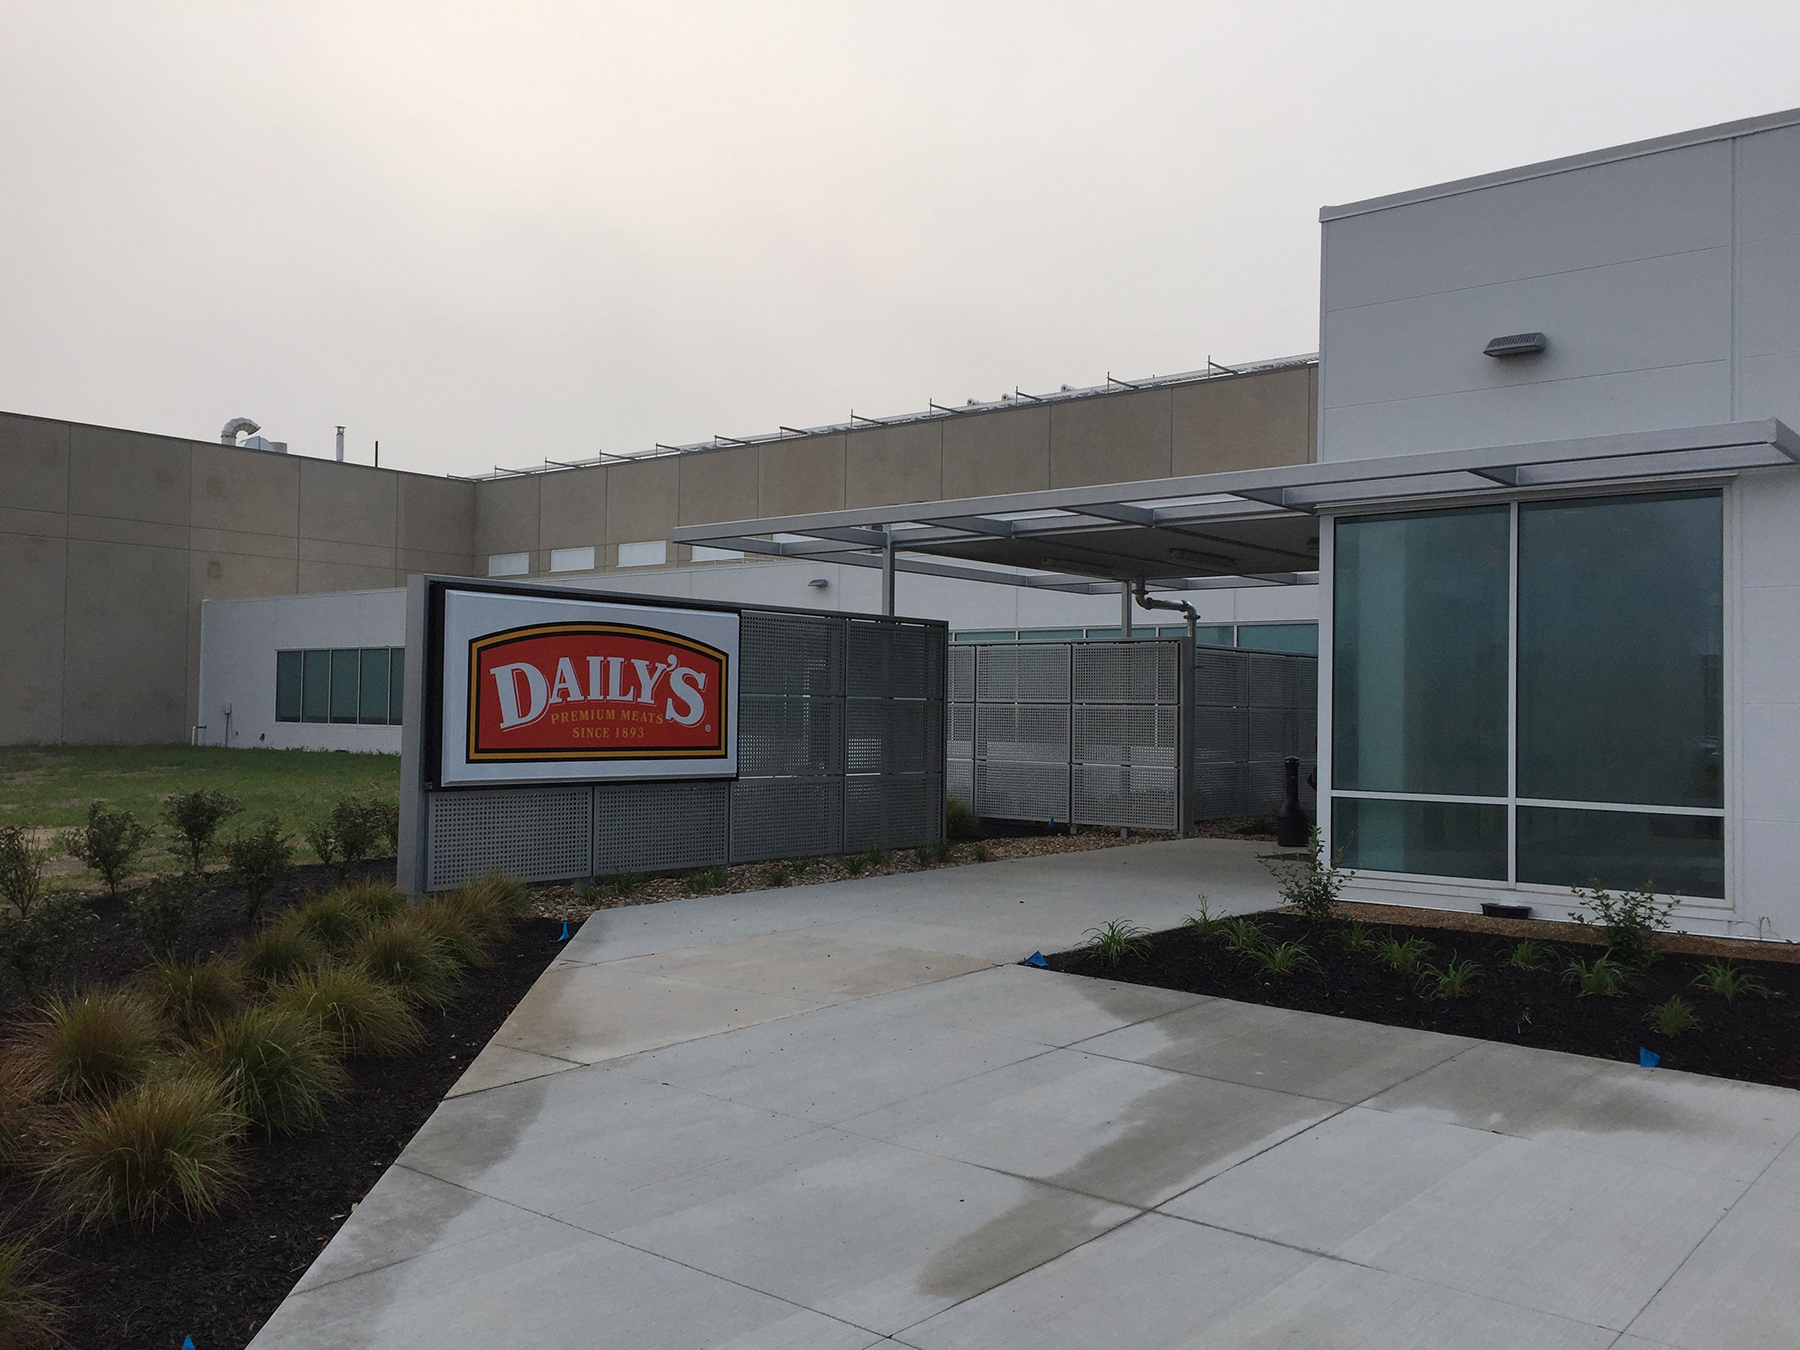 Dailys-Premium-Meats-St-Joseph-Missouri-